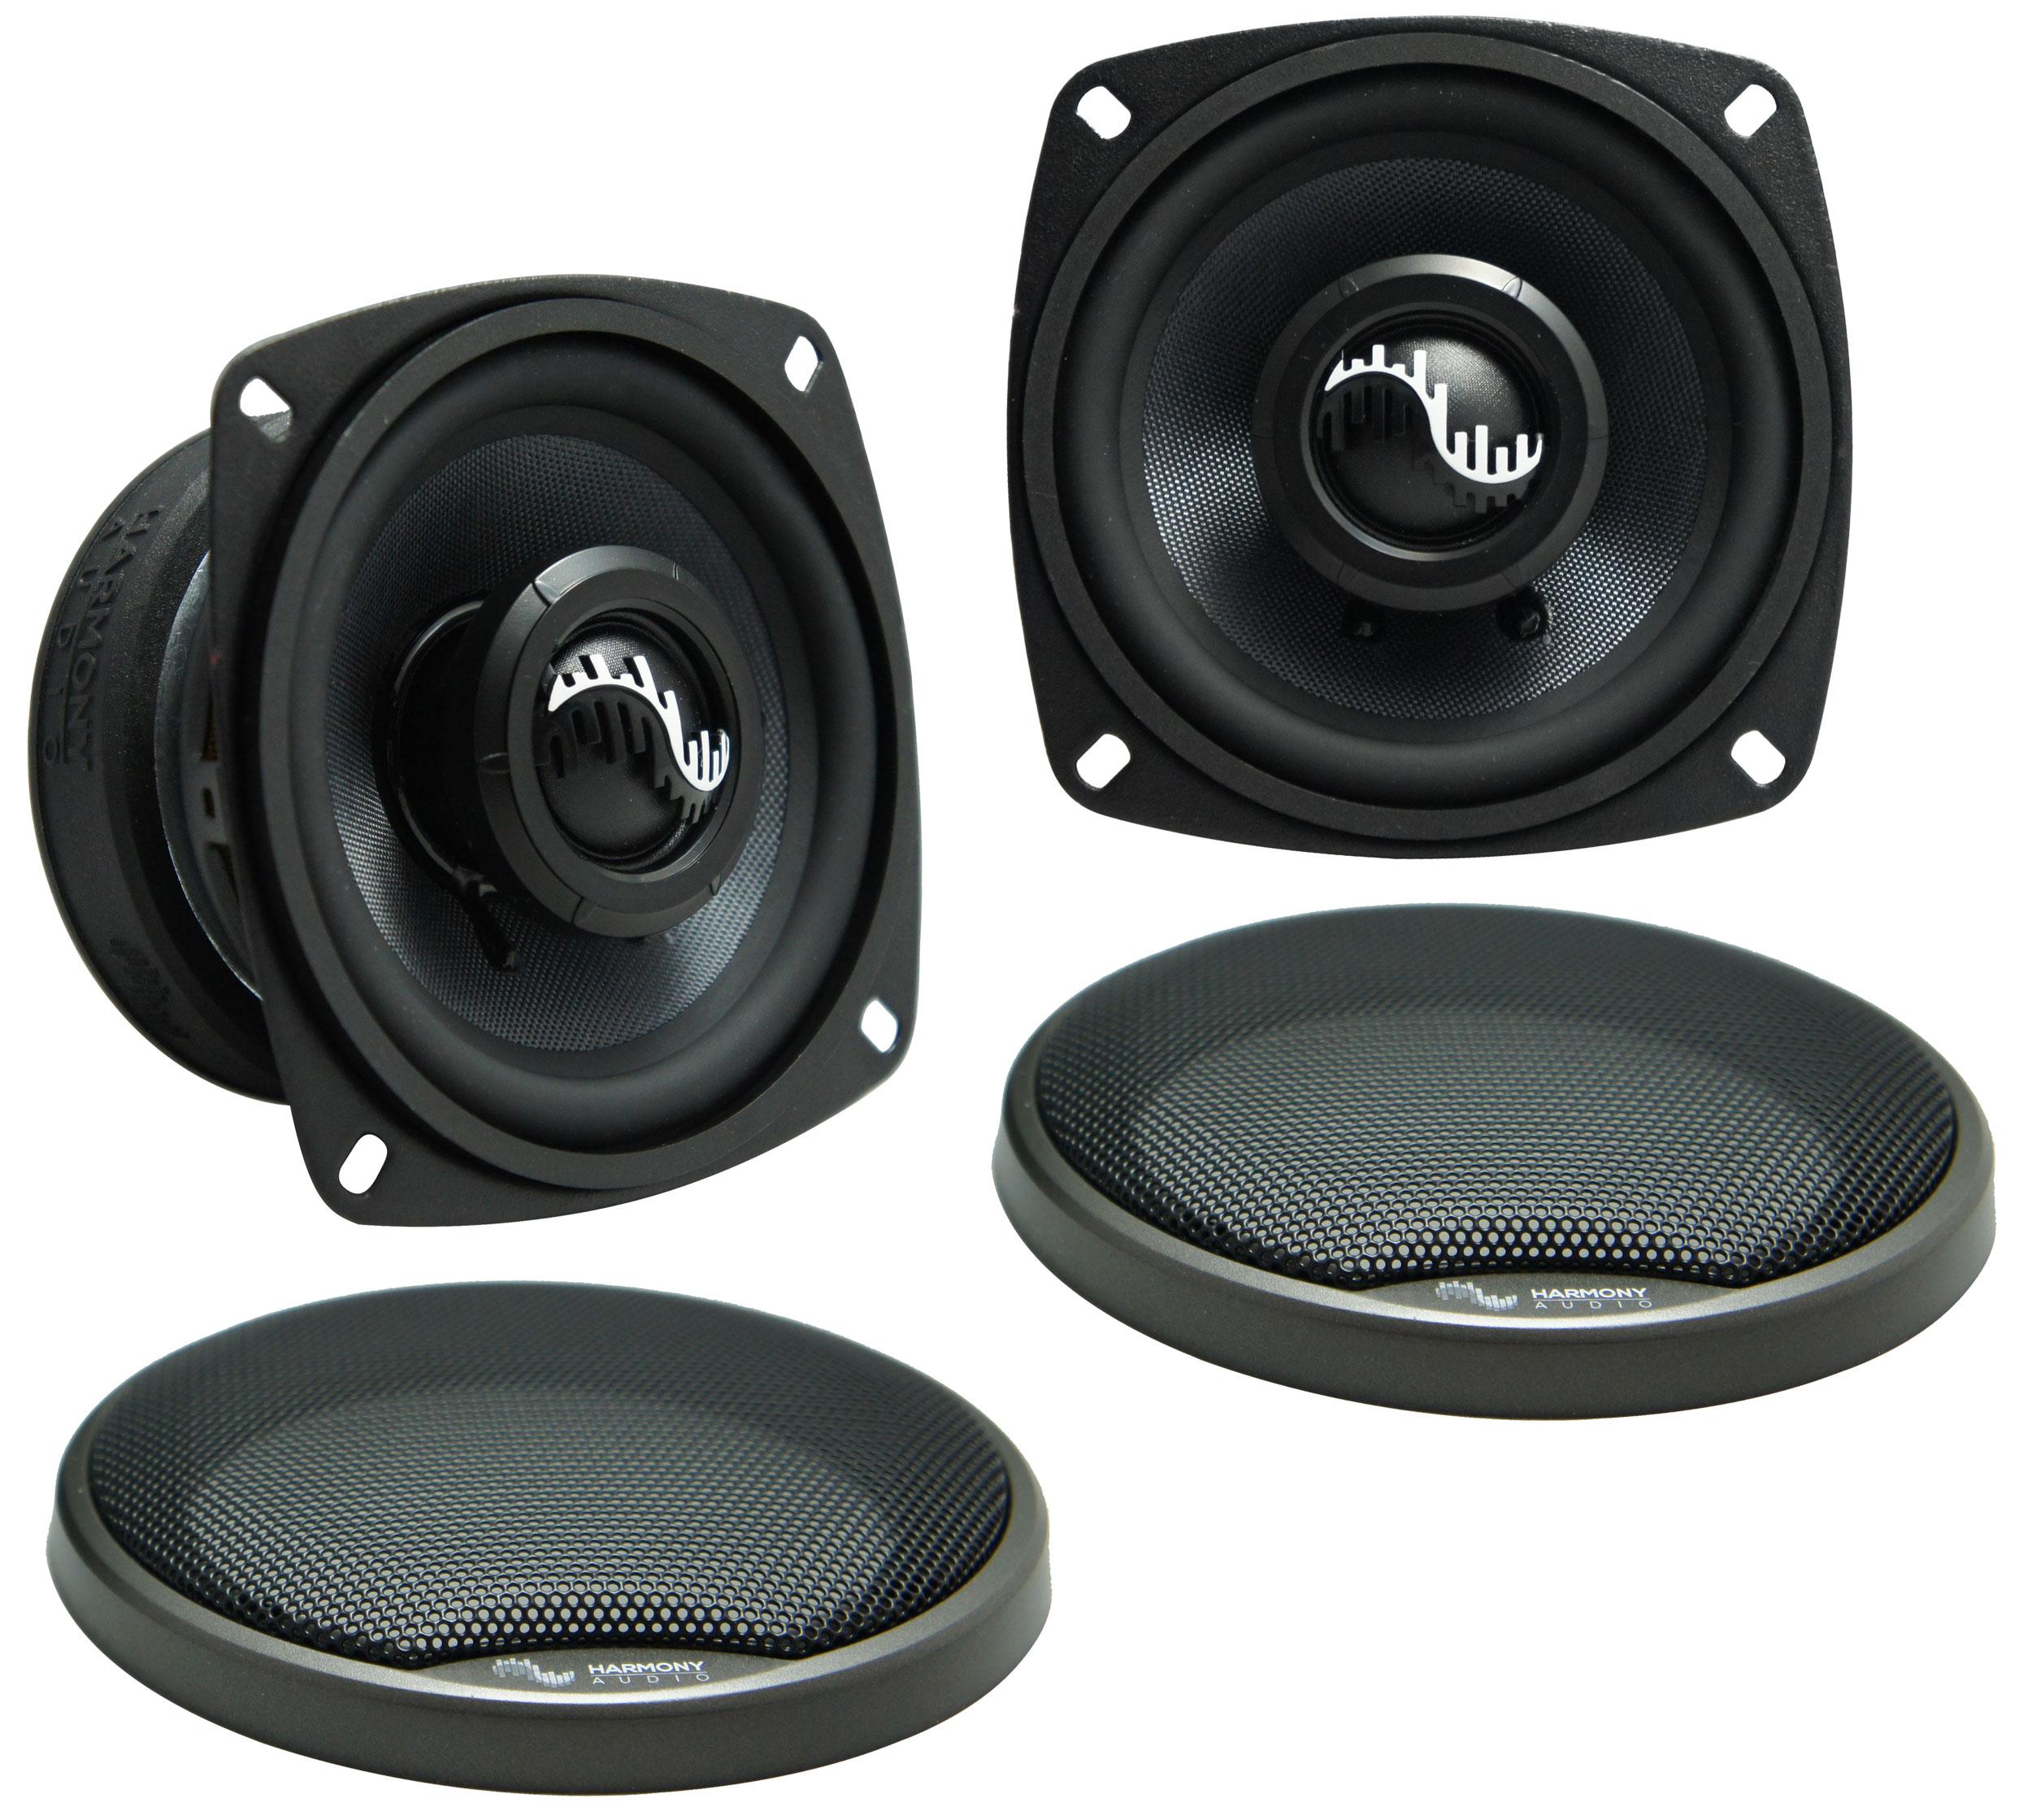 Fits Hyundai Accent 2006-2011 Front Door Replacement Harmony HA-C4 Premium Speakers New